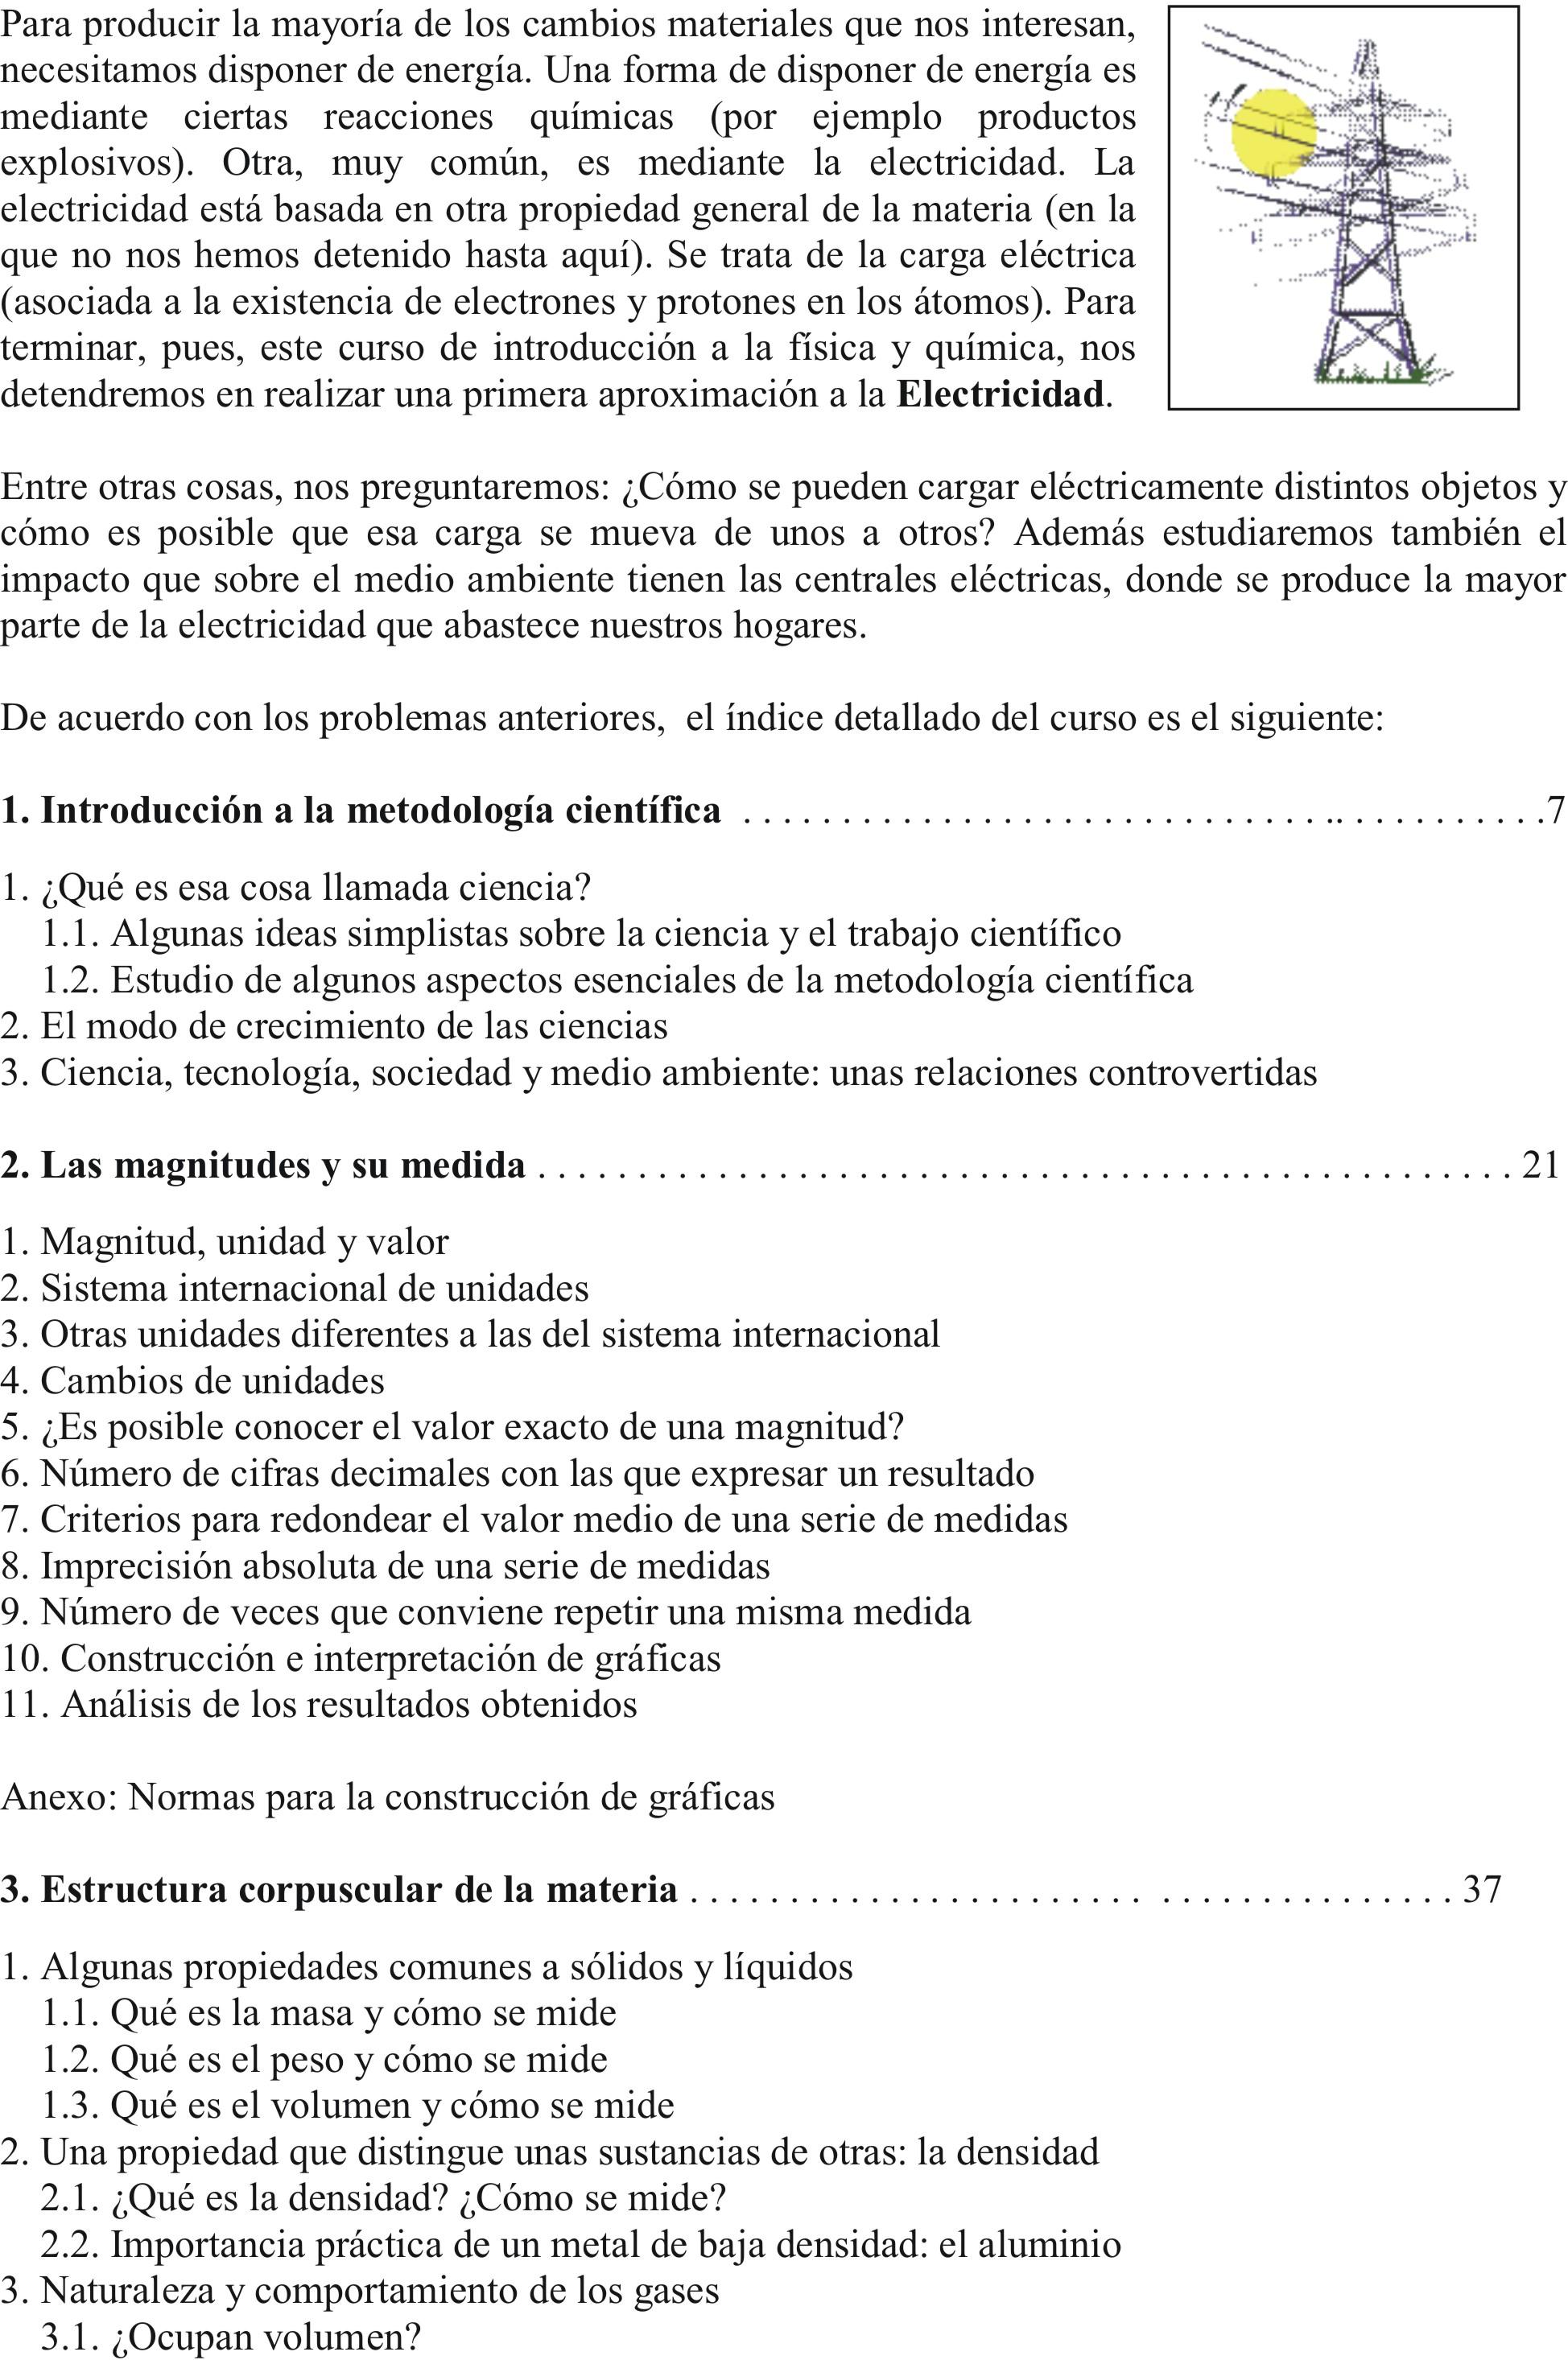 fq3eso-15-3